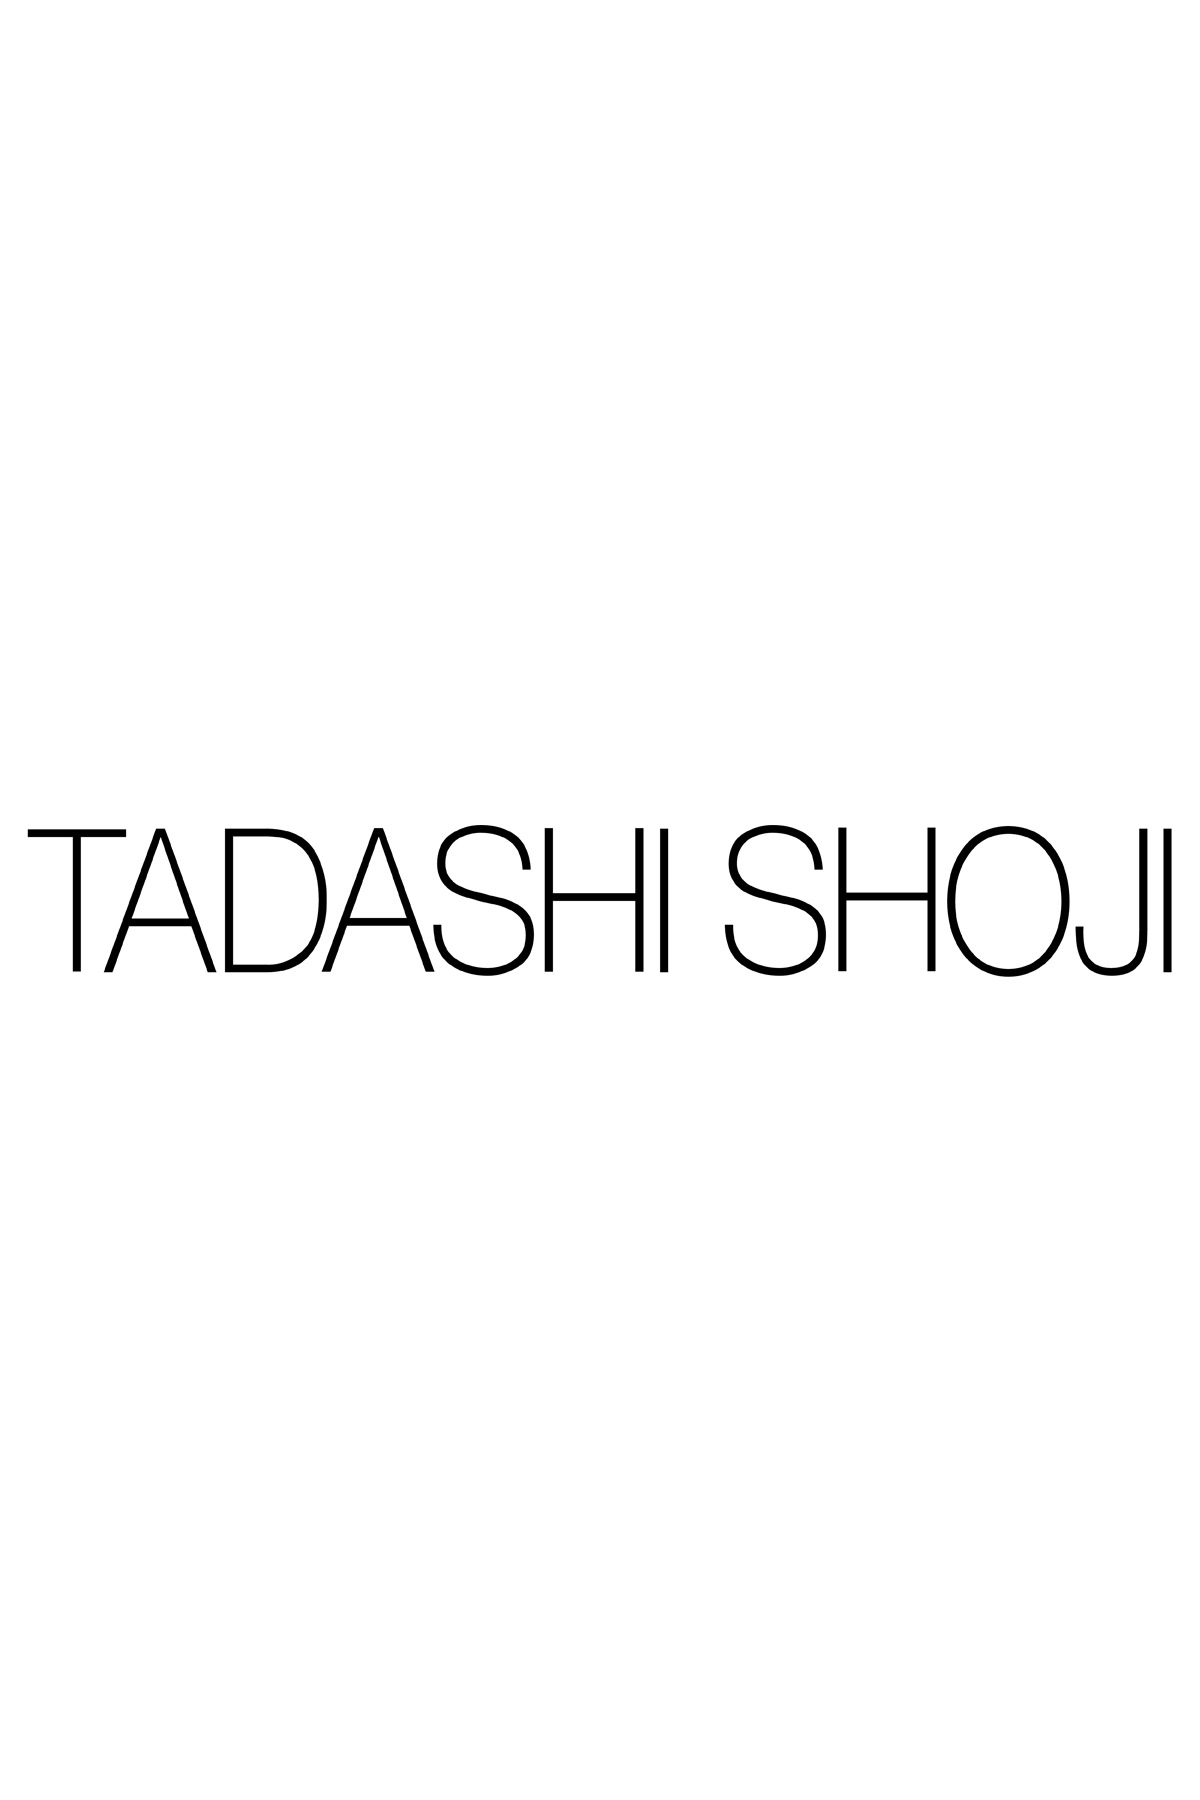 Tadashi Shoji Petite Size - Illusion Lace 3/4 Sleeve Dress with Grosgrain Ribbon Belt - Detail